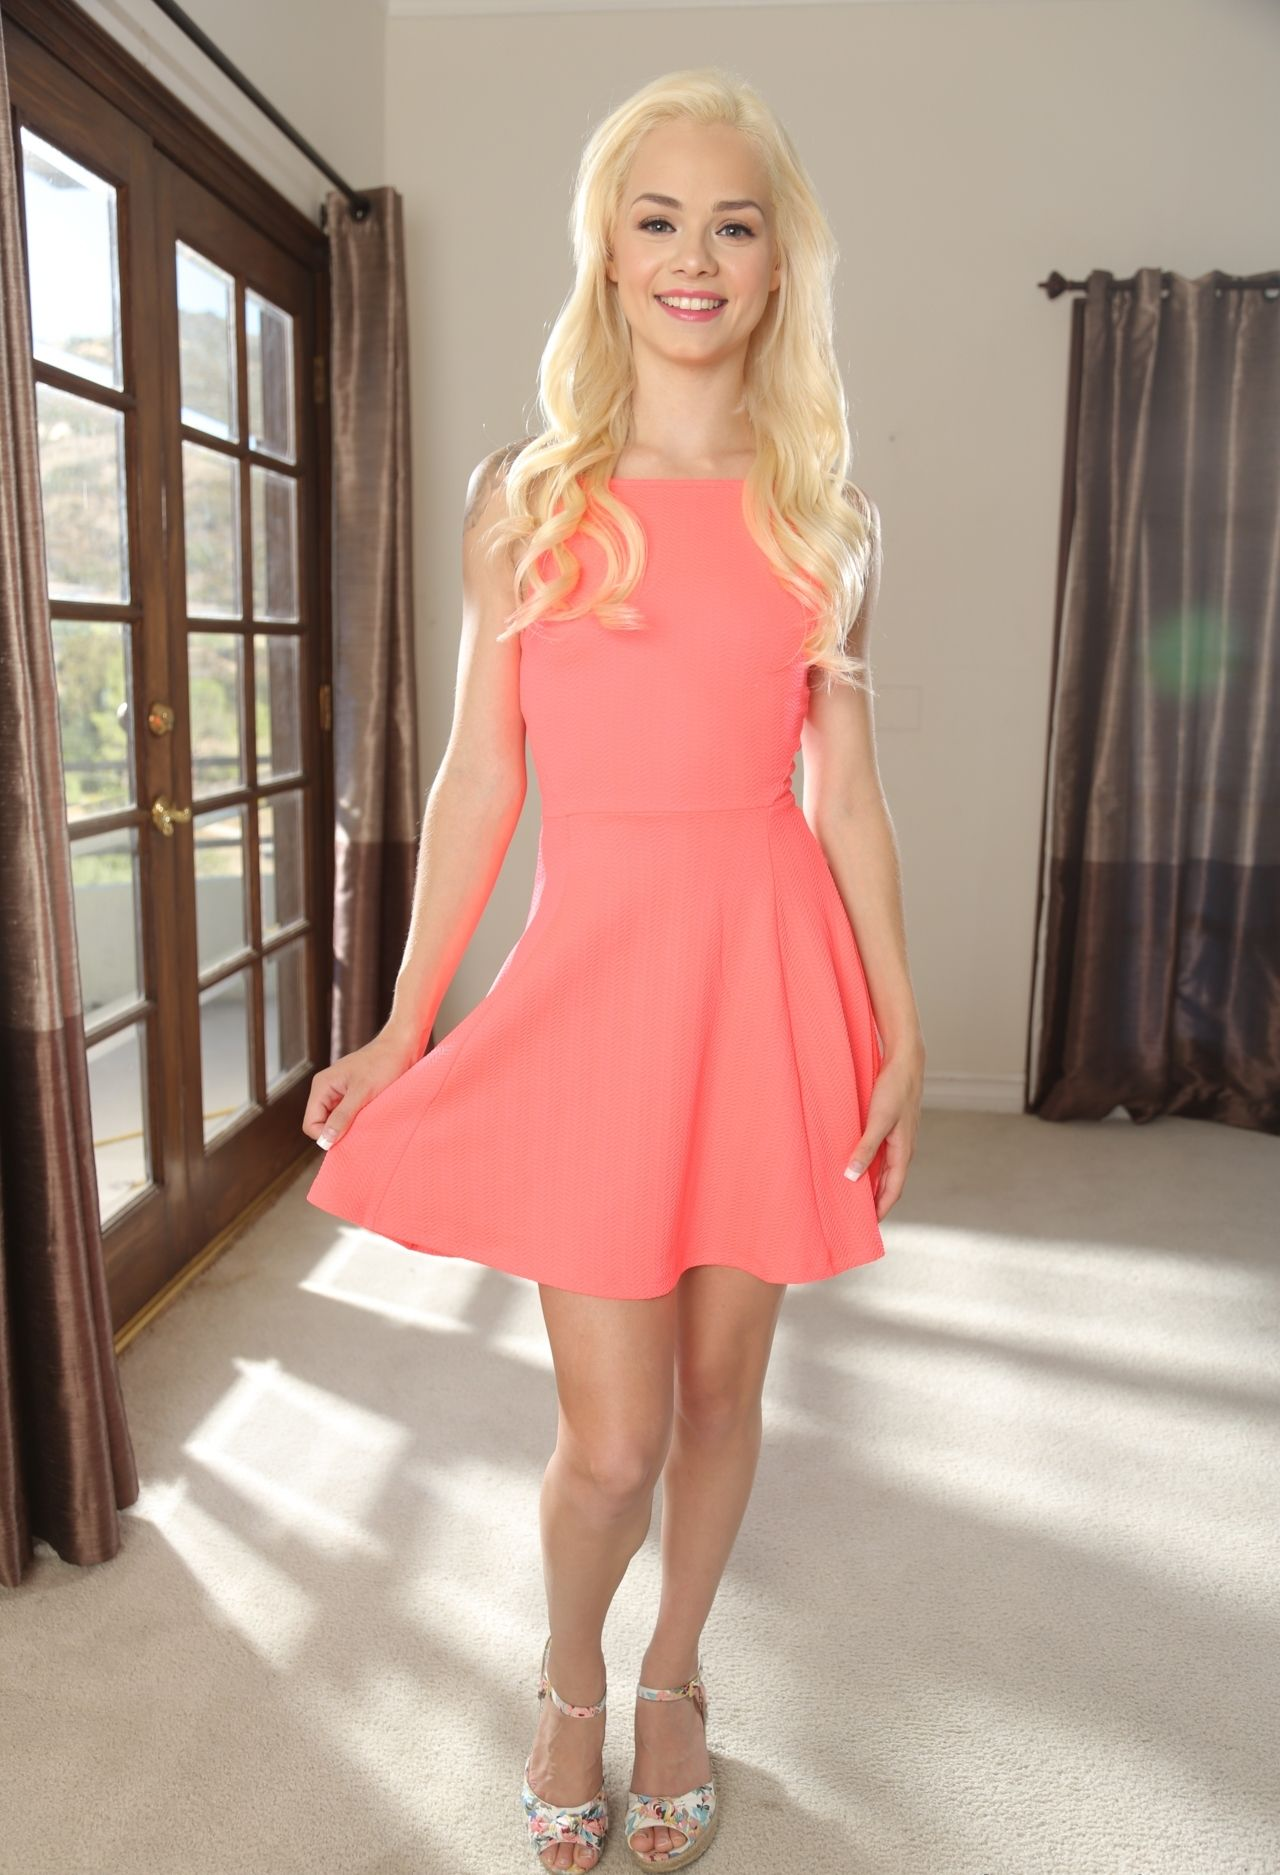 loves-huge-blonde-petite-molly-xxx